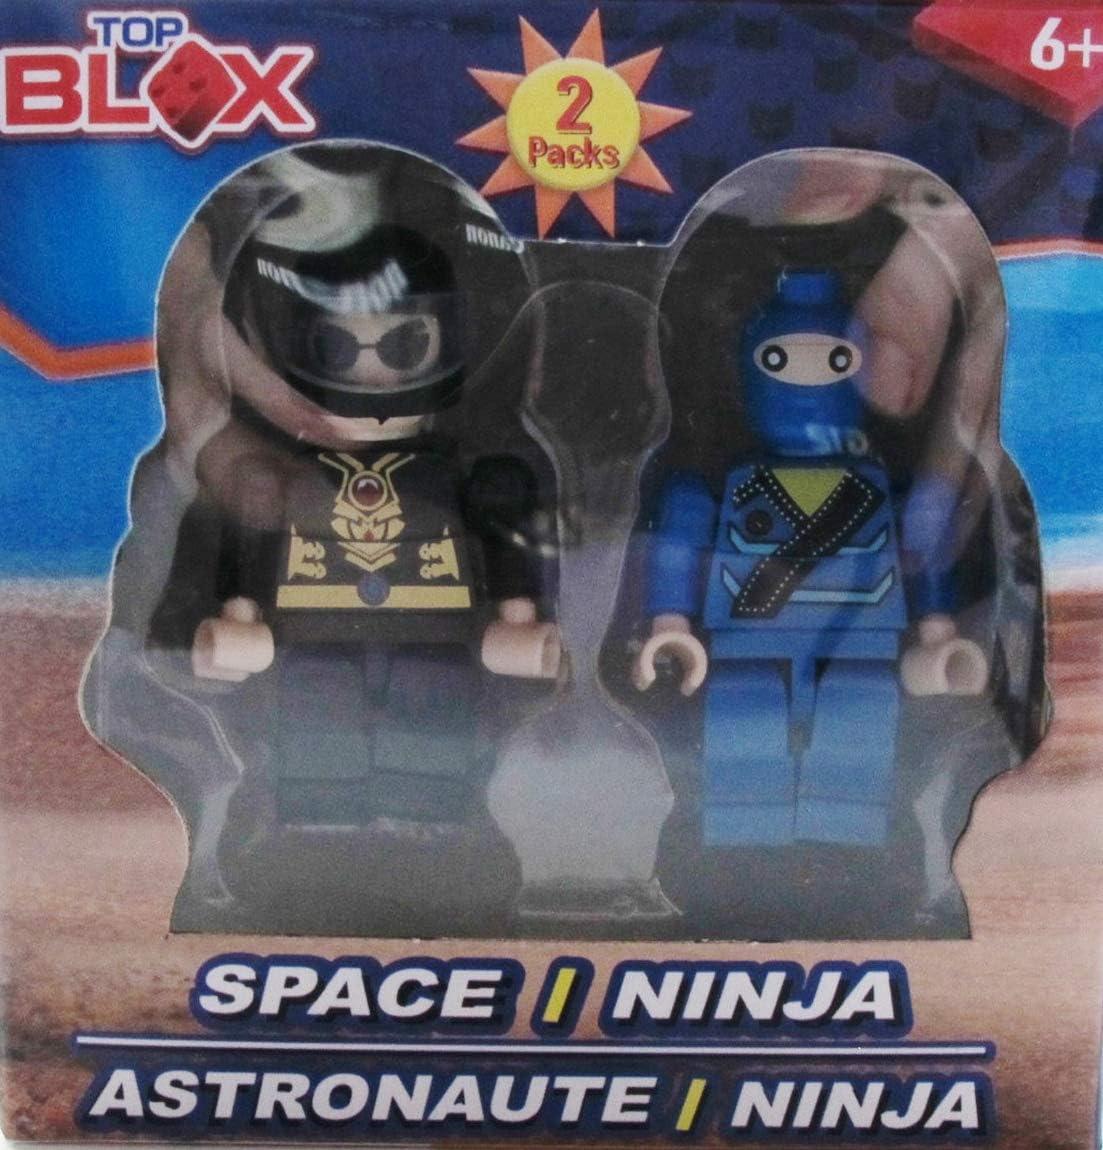 Amazon.com: Top Blox - 2 pc People Set Astronaut / Ninja ...